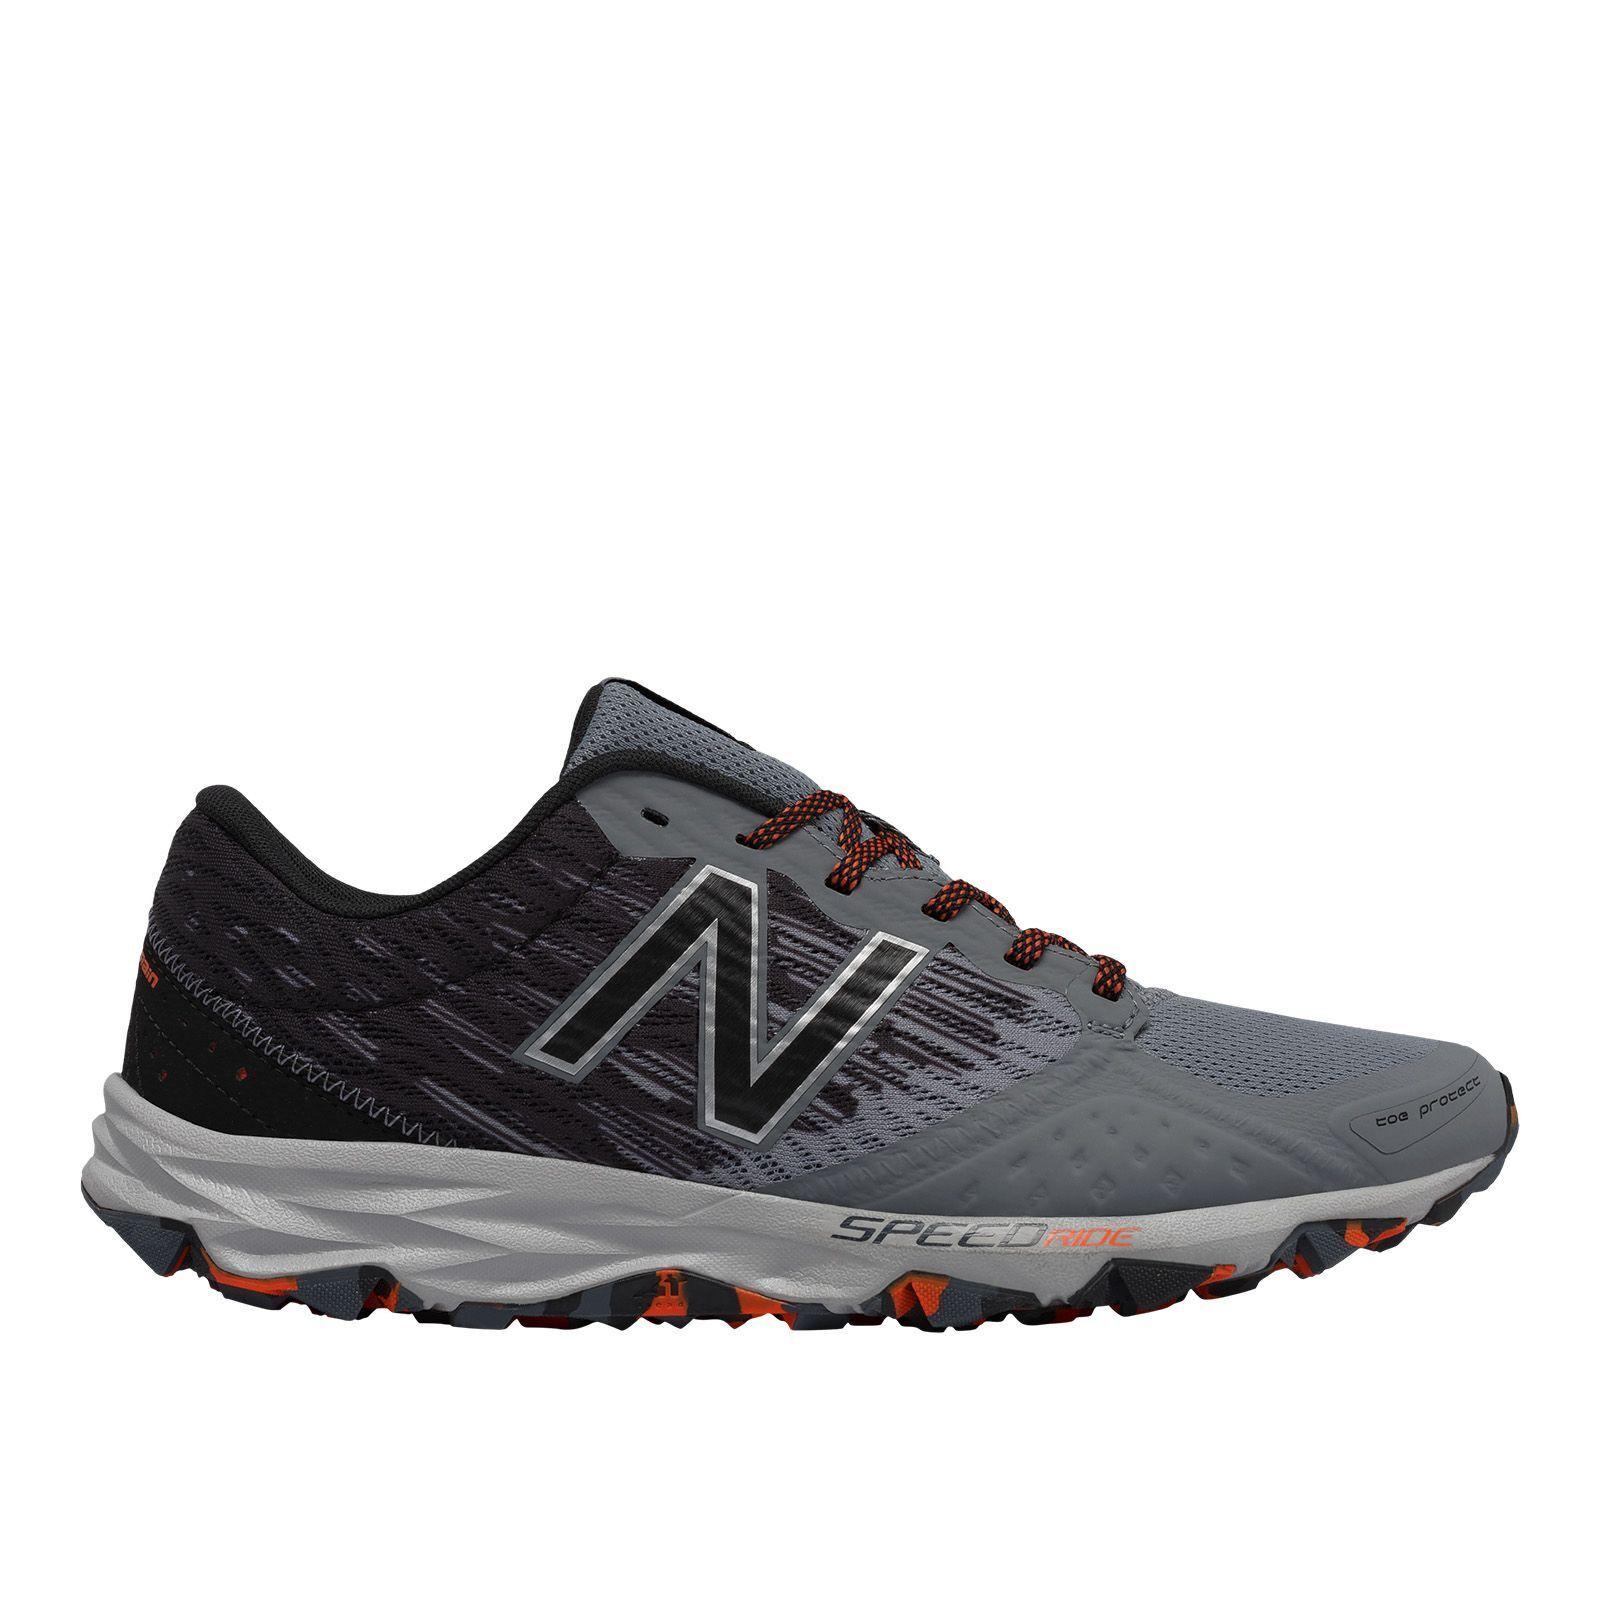 Para Hombre New Balance T690V2 Running zapatos gris Plomo  NJN5U-529